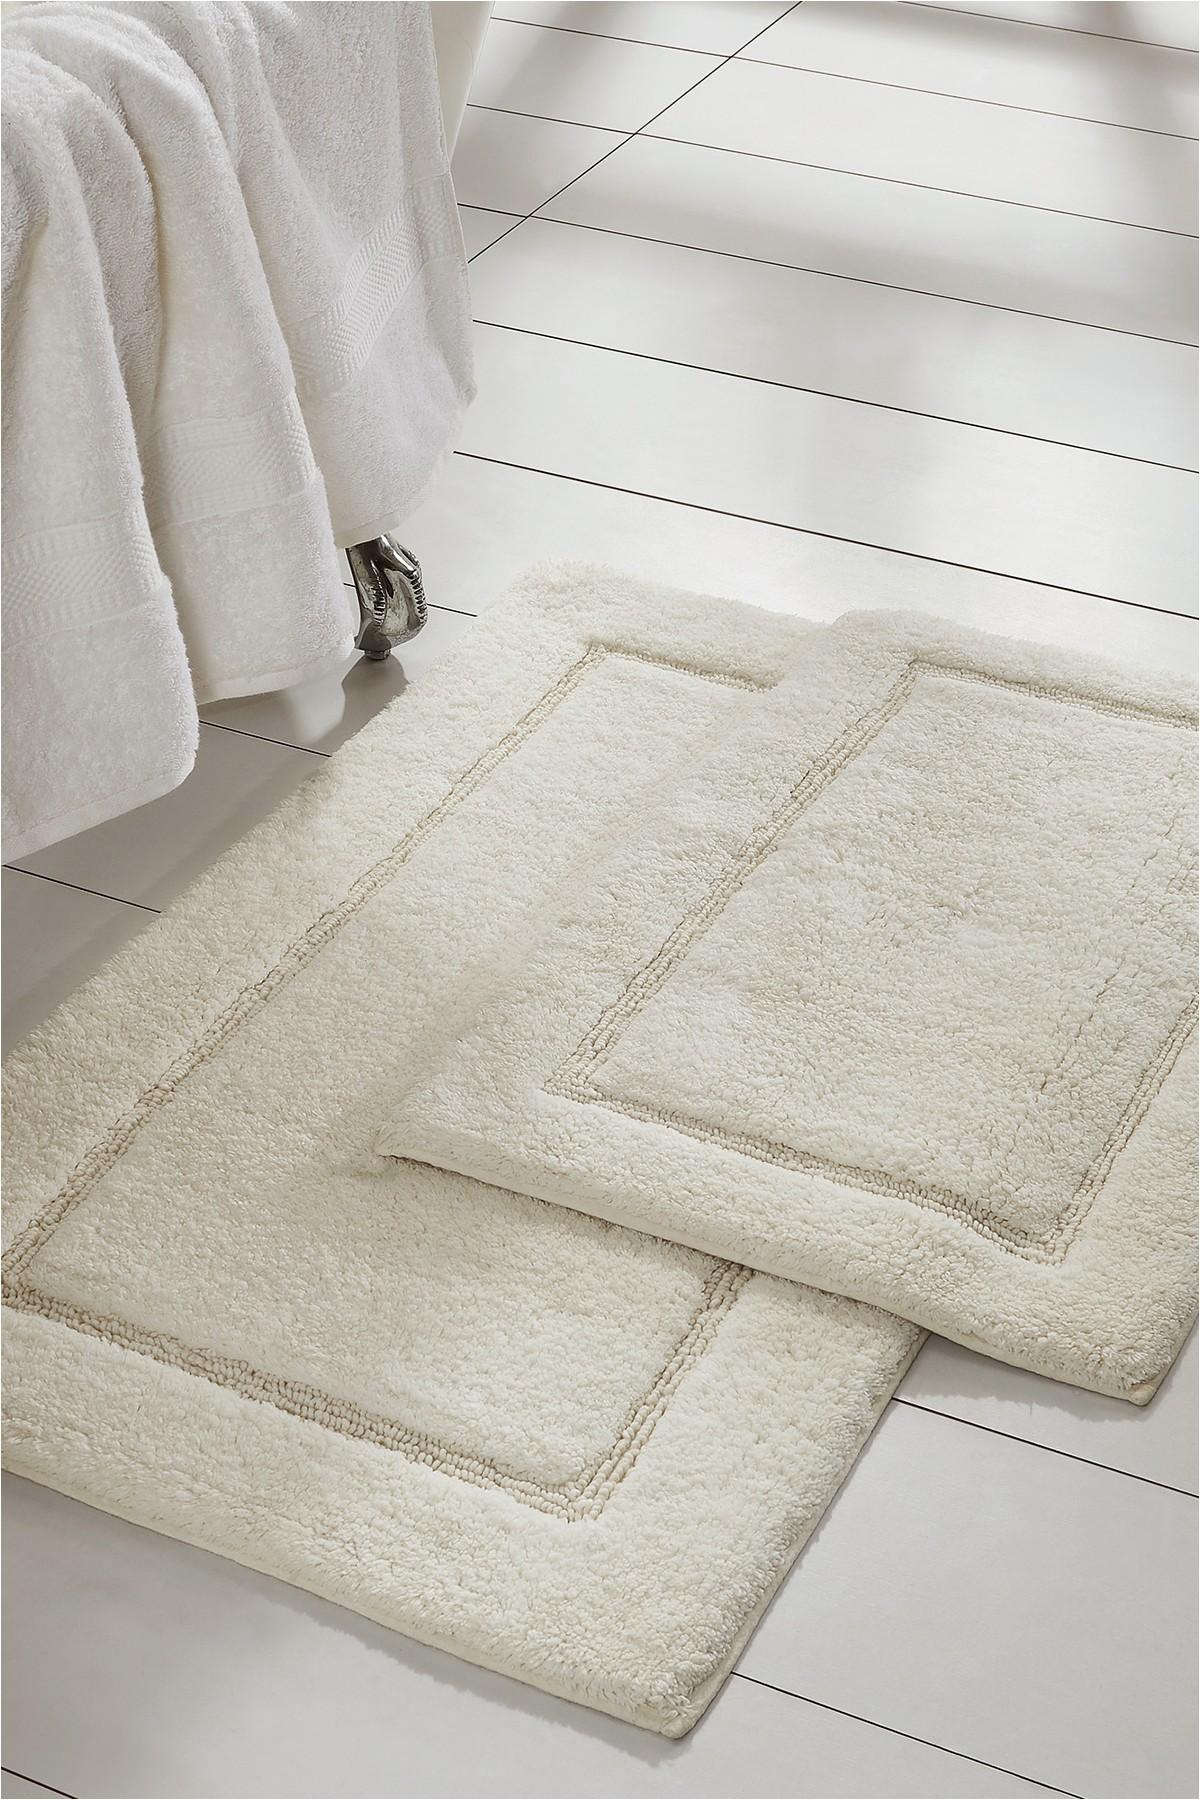 Off White Bathroom Rugs F White Bathroom Rug Set Image Of Bathroom and Closet